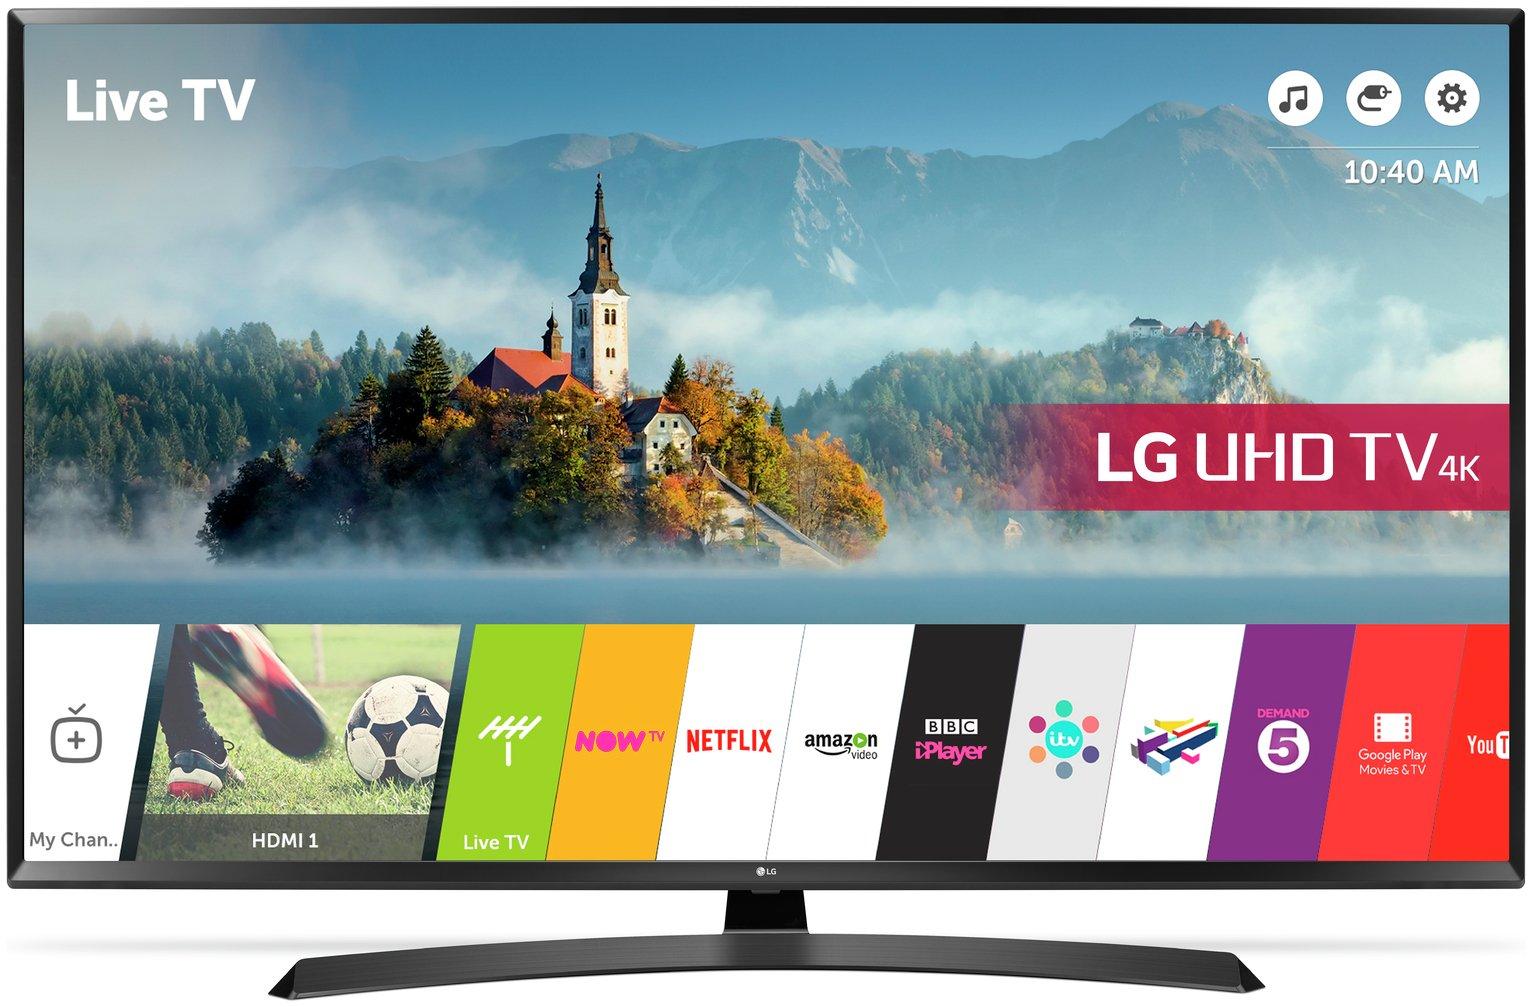 lg tv 49 inch 4k. lg 49uj635v 49 inch smart 4k ultra hd tv with hdr lg tv 4k